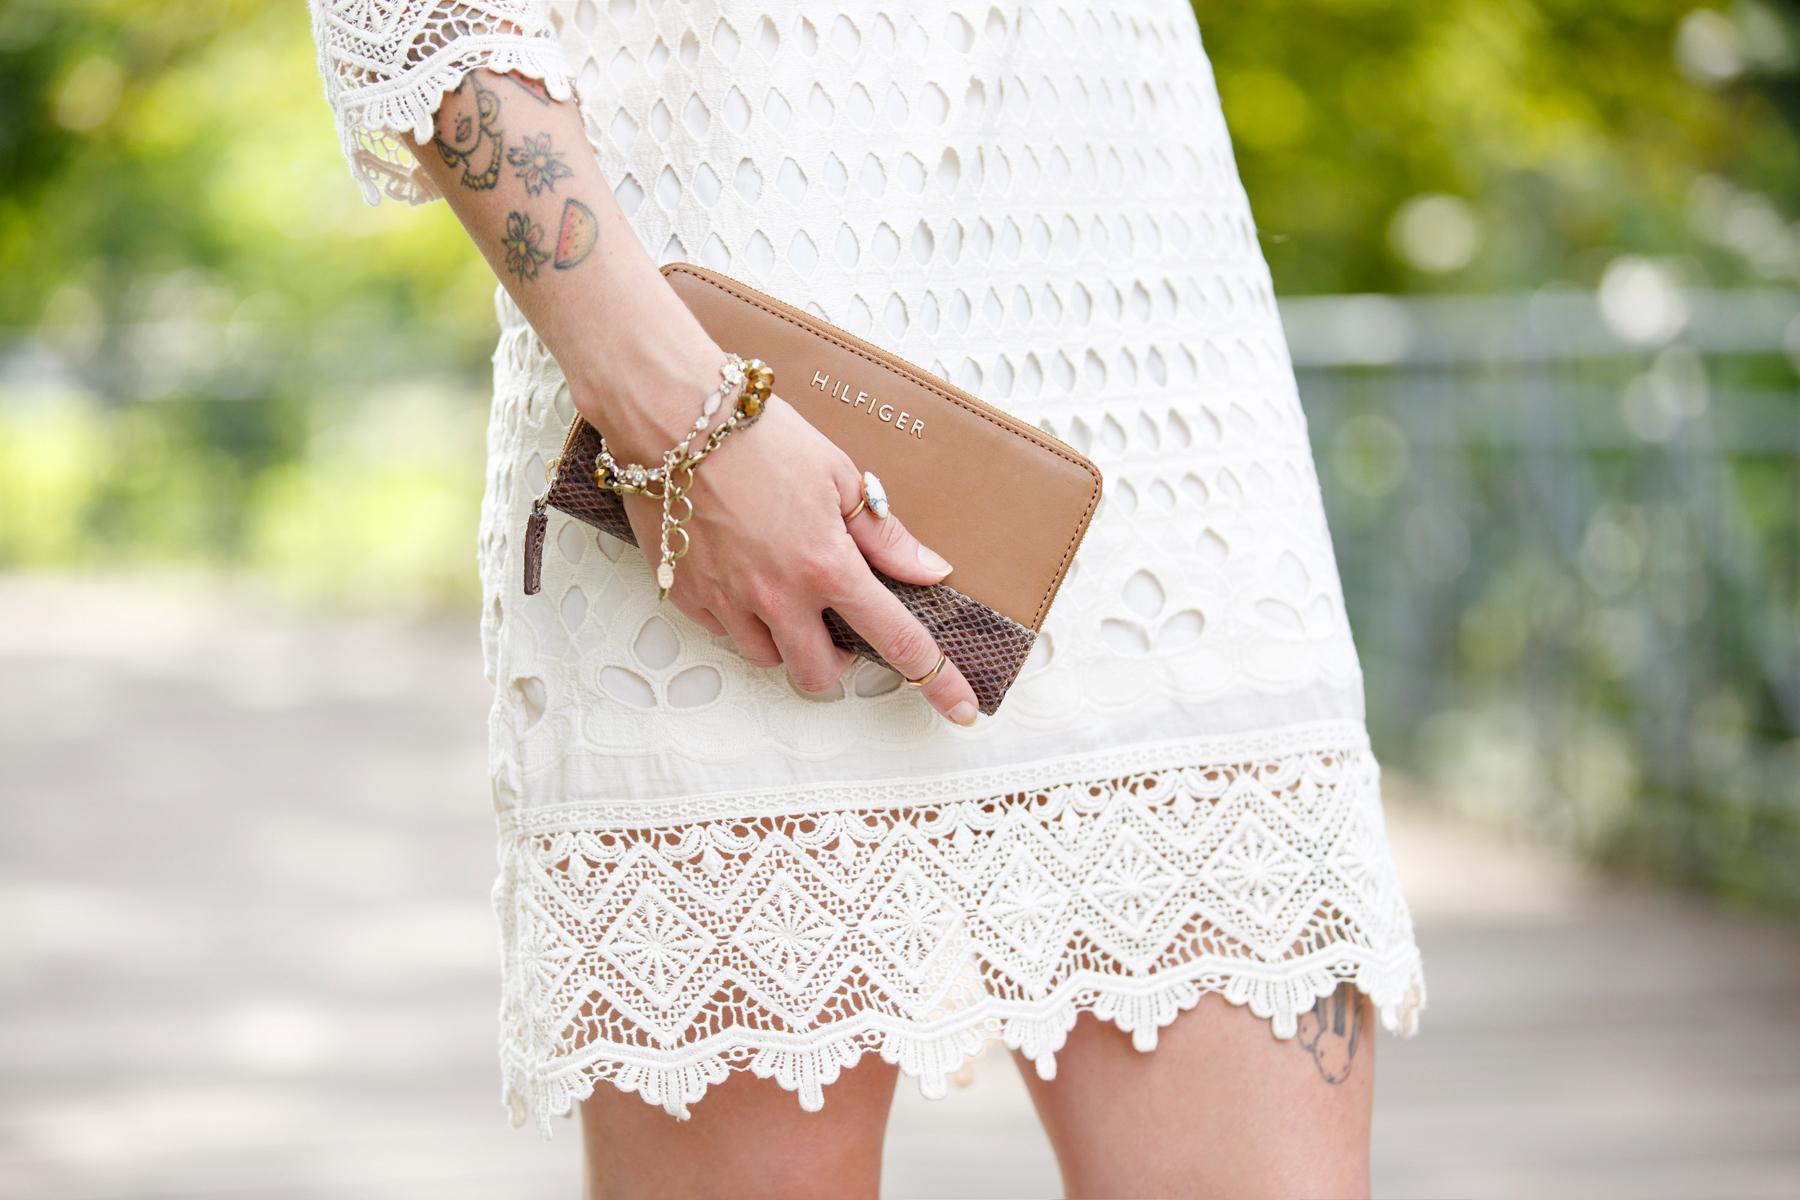 dress-for-less outfit styling white sommerkleid summer look crochet wrangler hilfiger fashion blog germany düsseldorf ricarda schernus cats & dogs 2